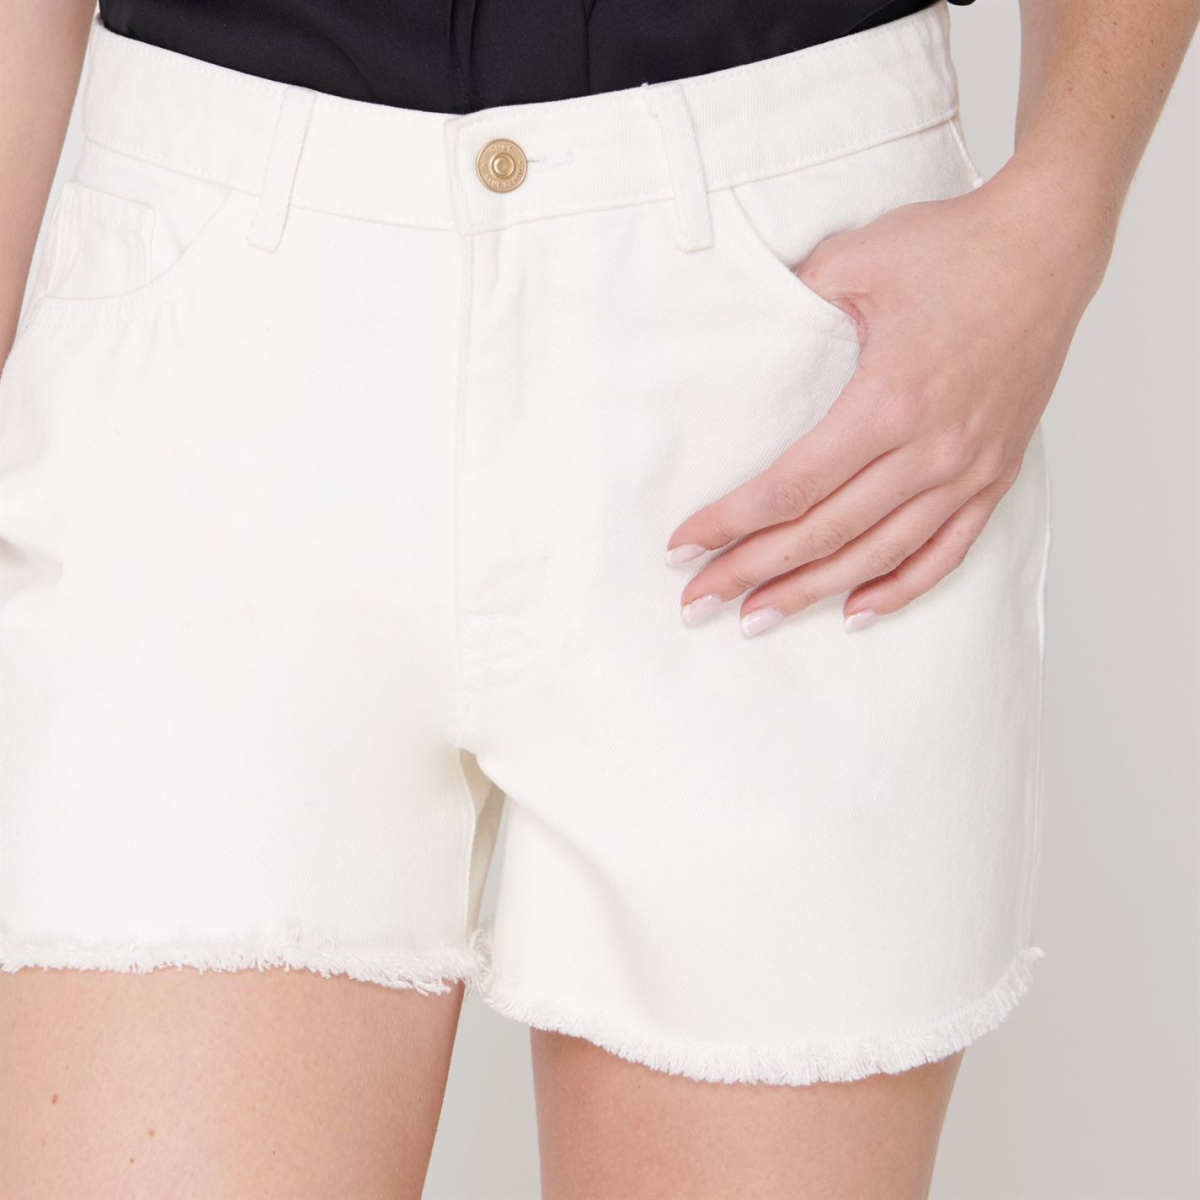 Only-Damen-Kurzhose-Shorts-Damenhose-Sporthose-Bermuda-Sommer-7093 Indexbild 10